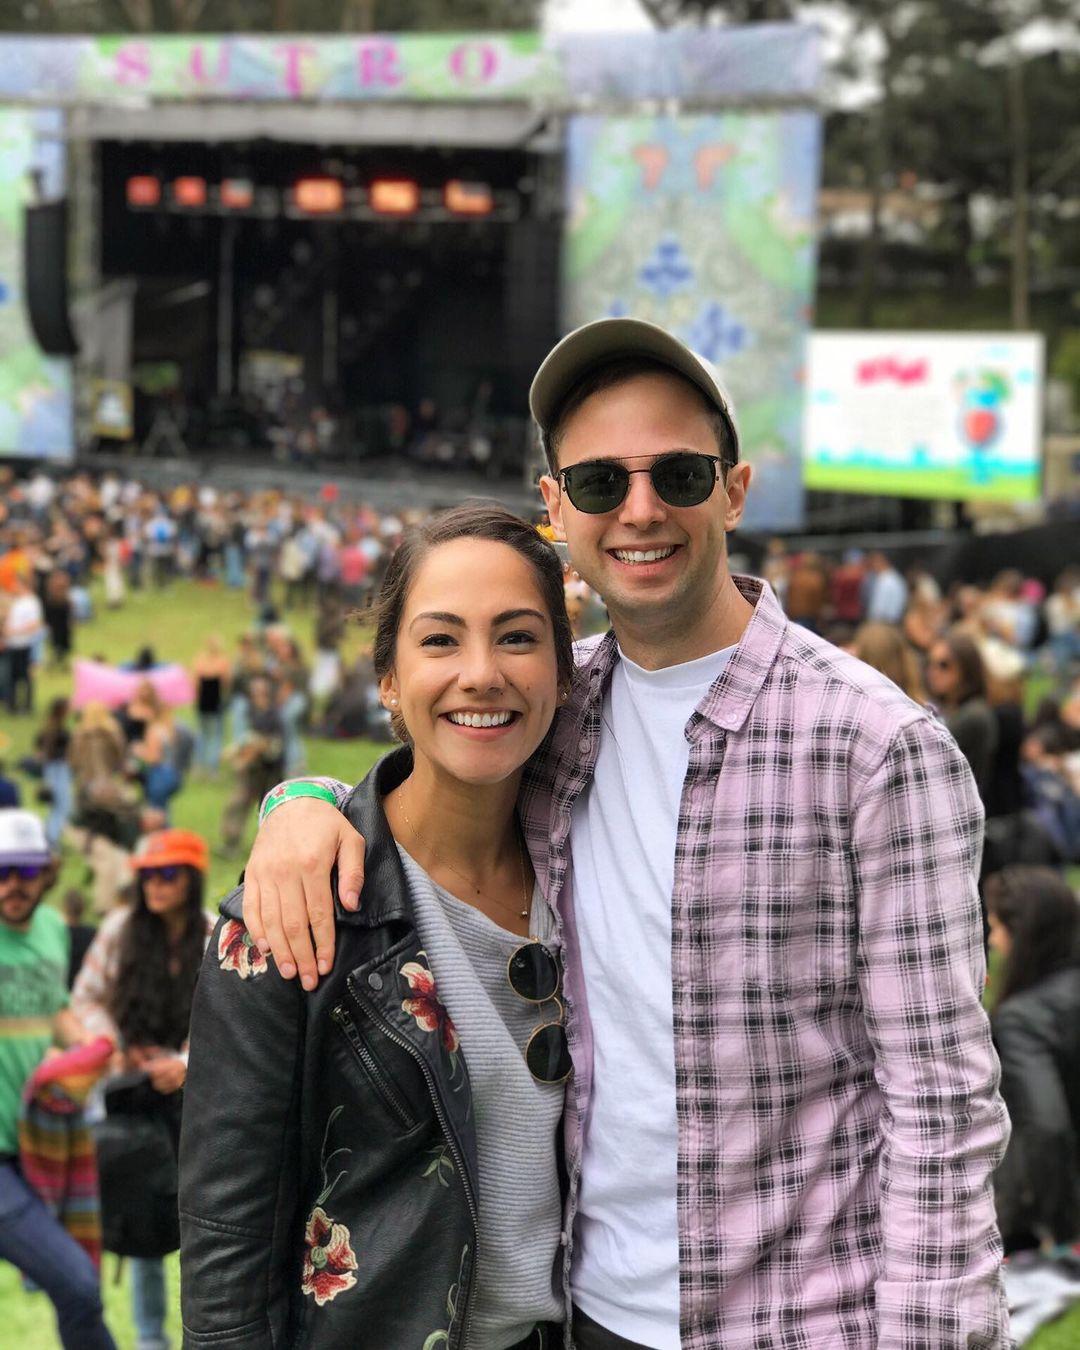 Maggie with her fiance Zach